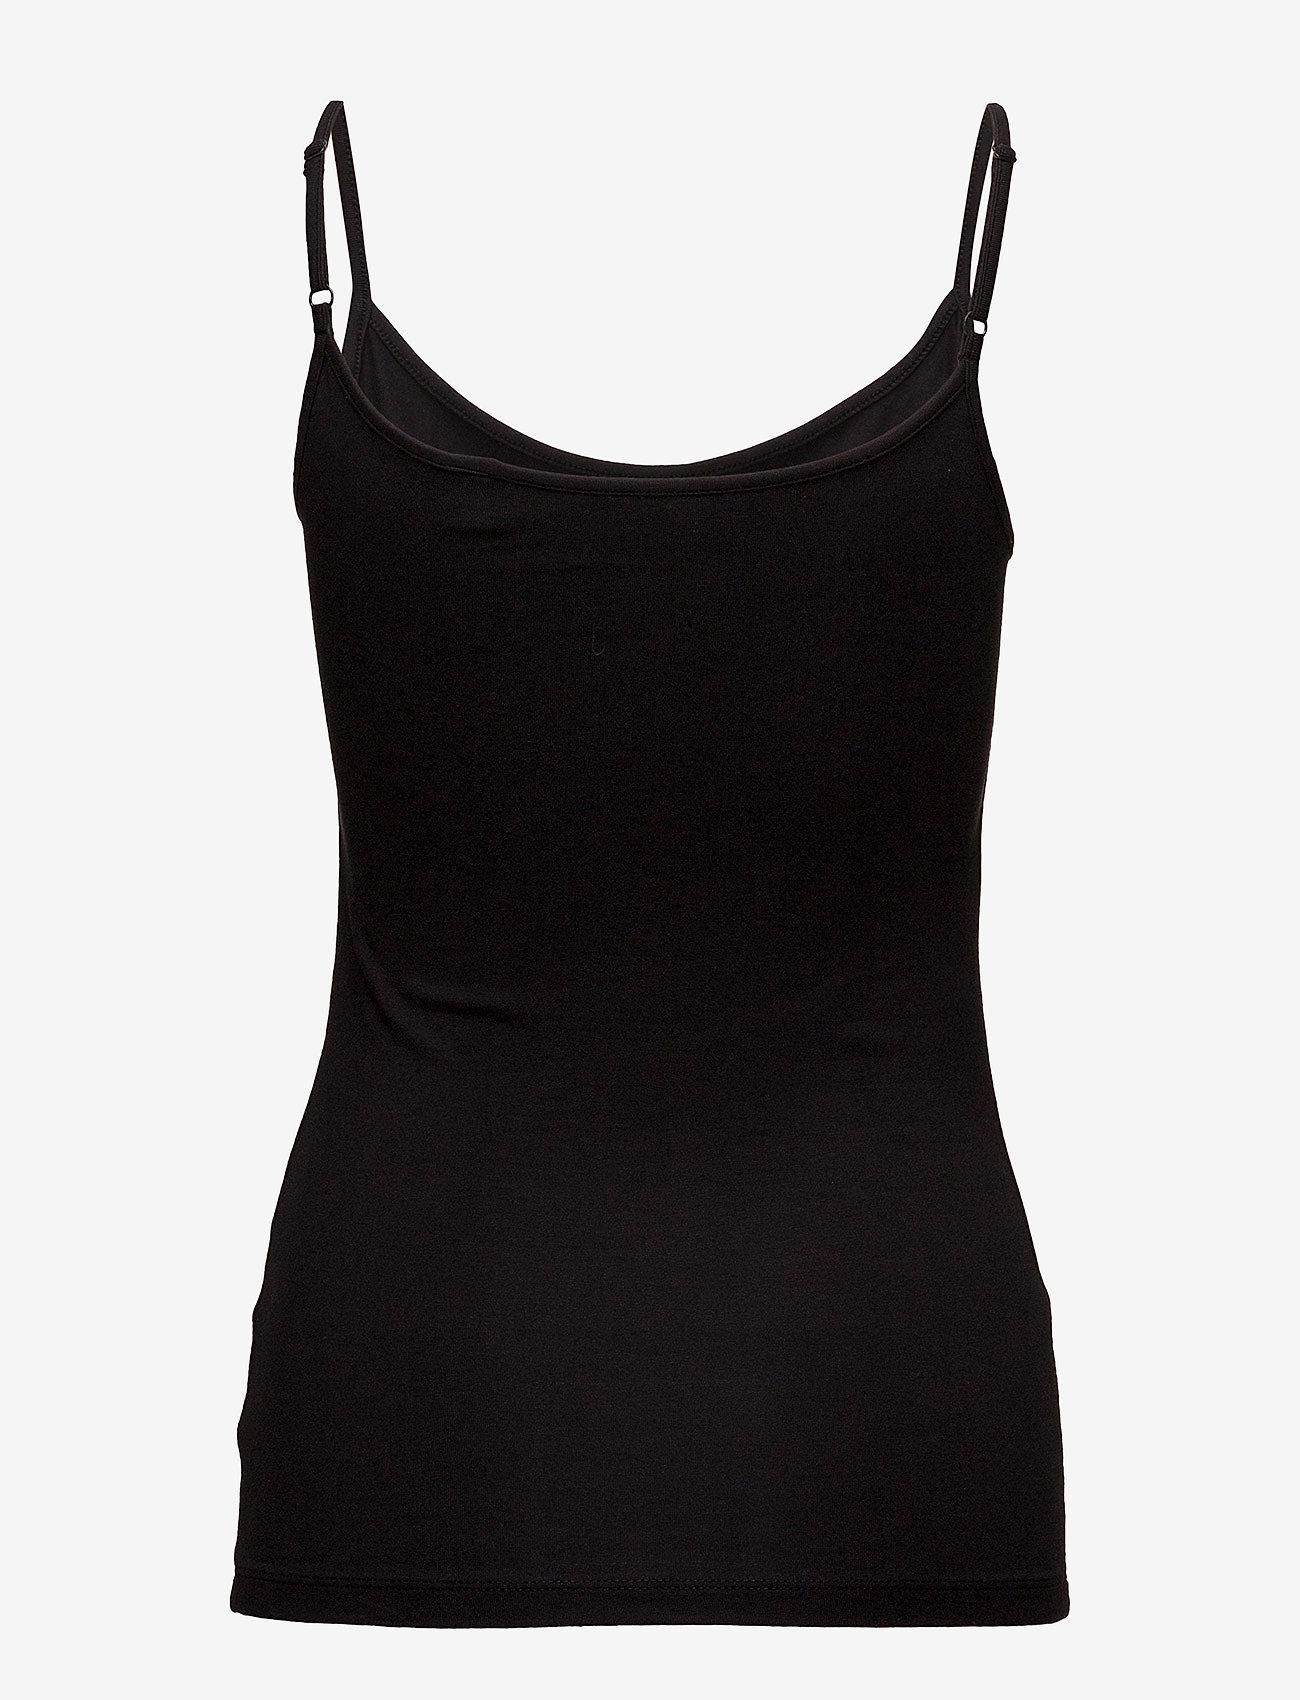 Esprit Casual - T-Shirts - sleeveless tops - black - 1